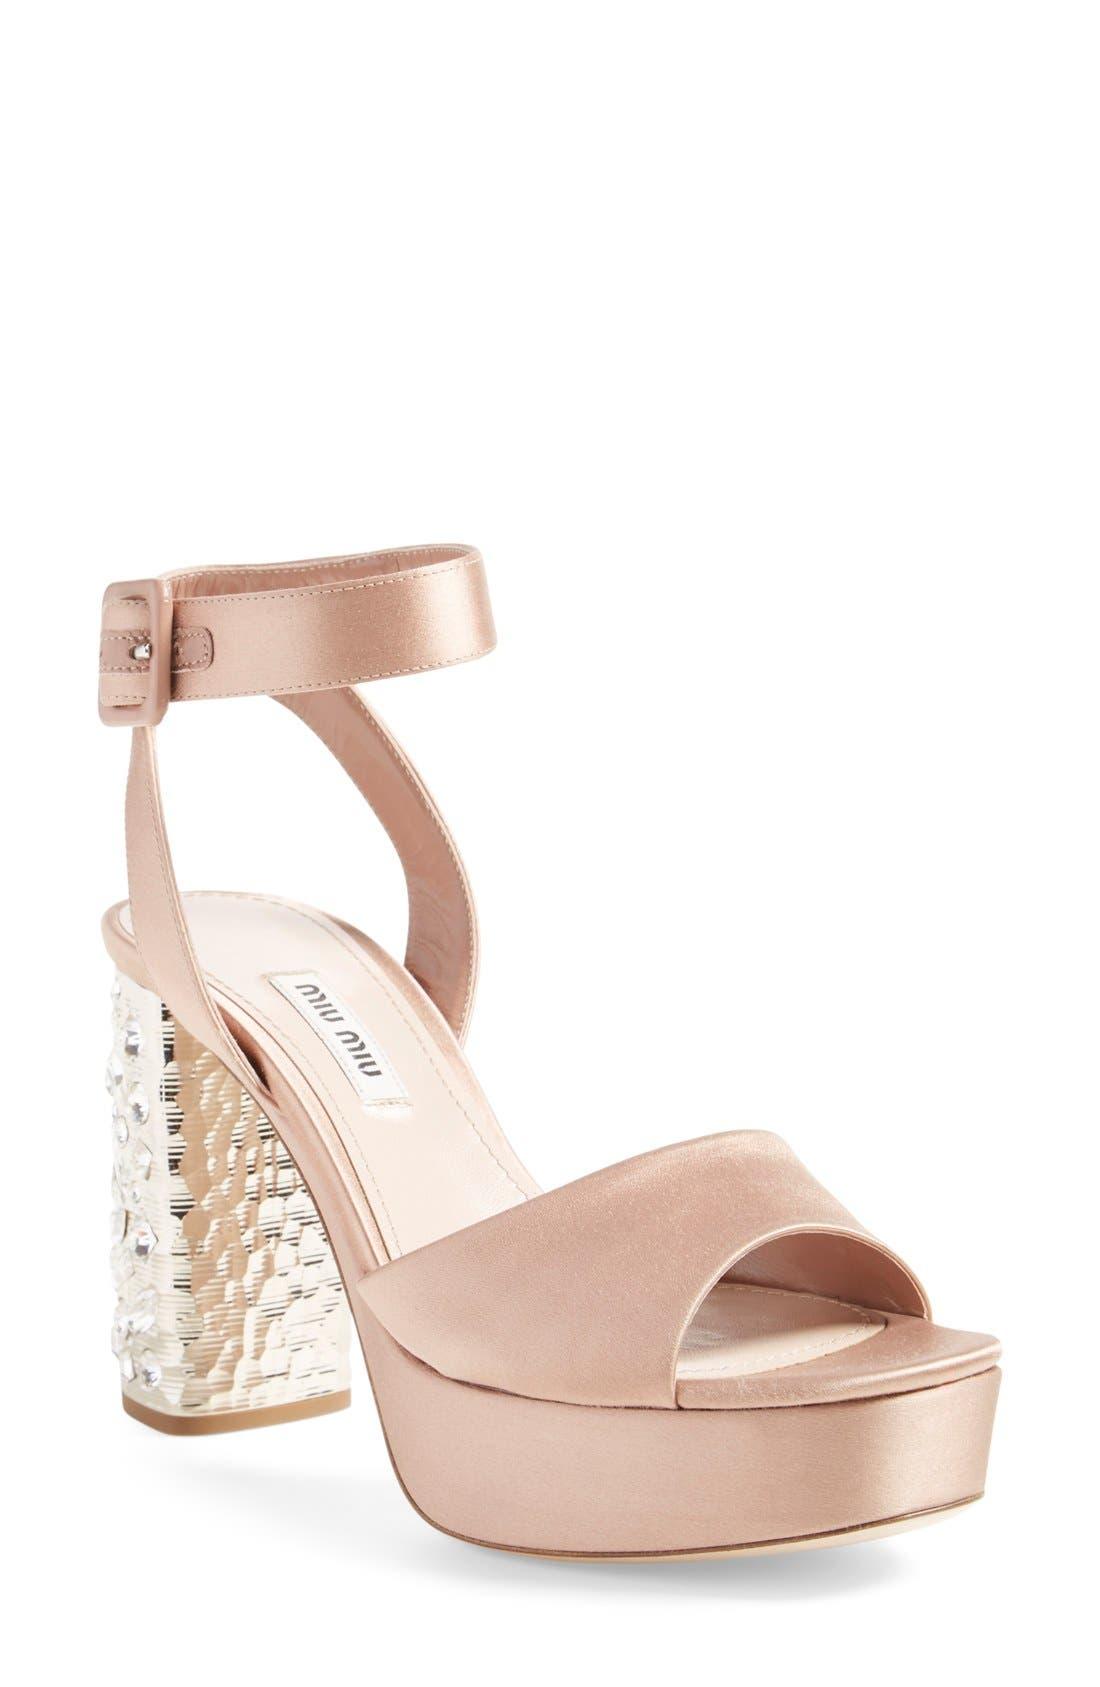 MIU MIU Studded Block Heel Platform Sandal